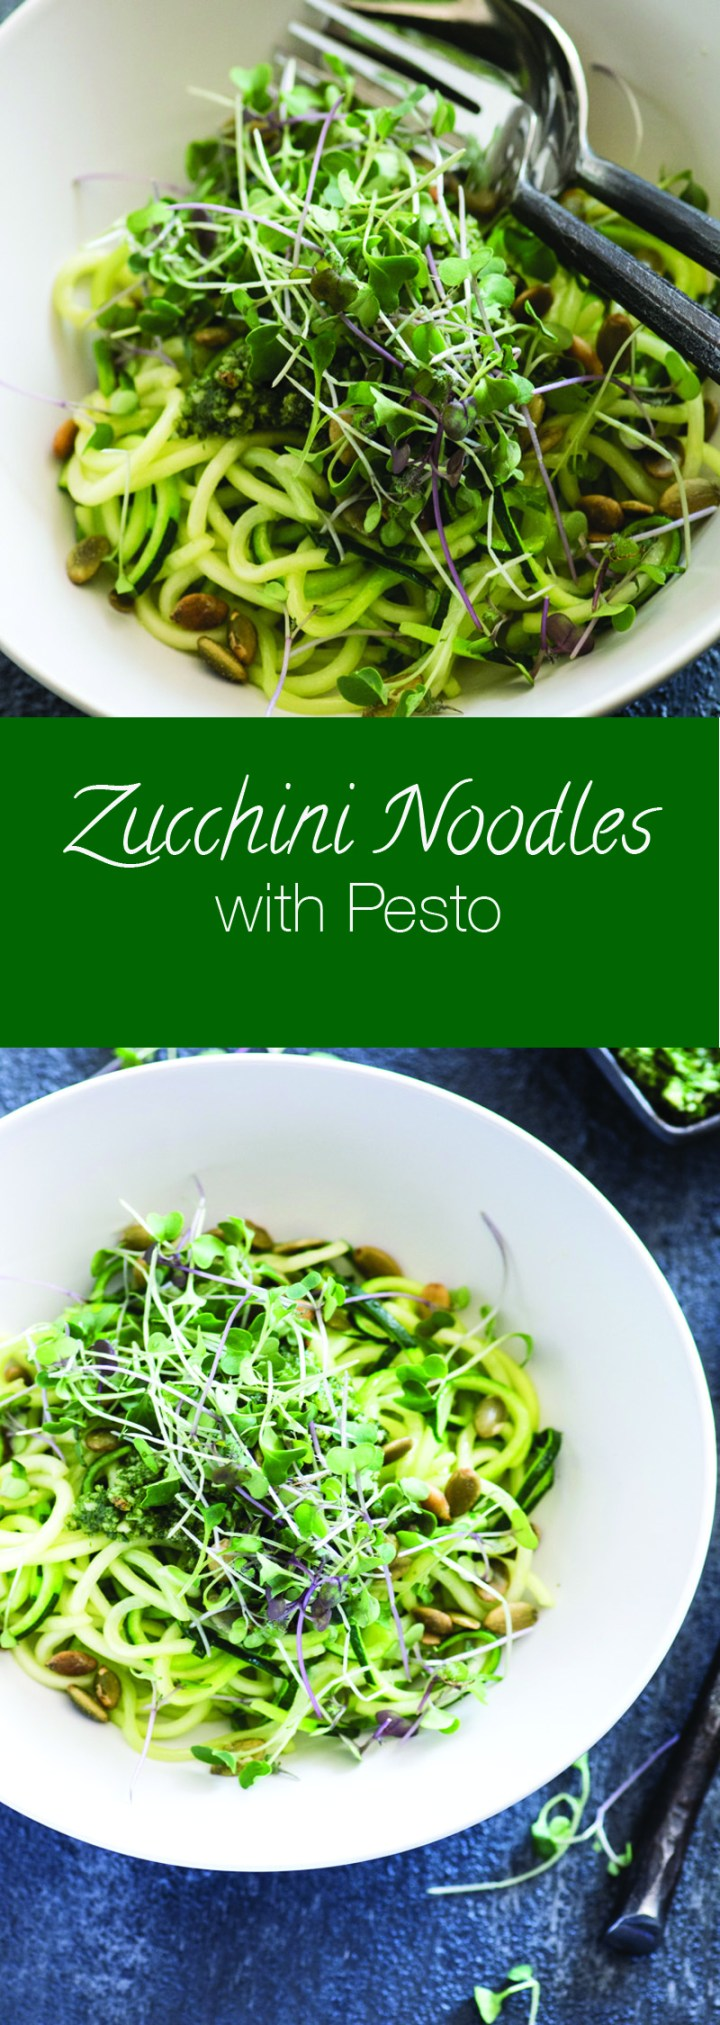 Zucchini Noodles with Almond Basil Pesto